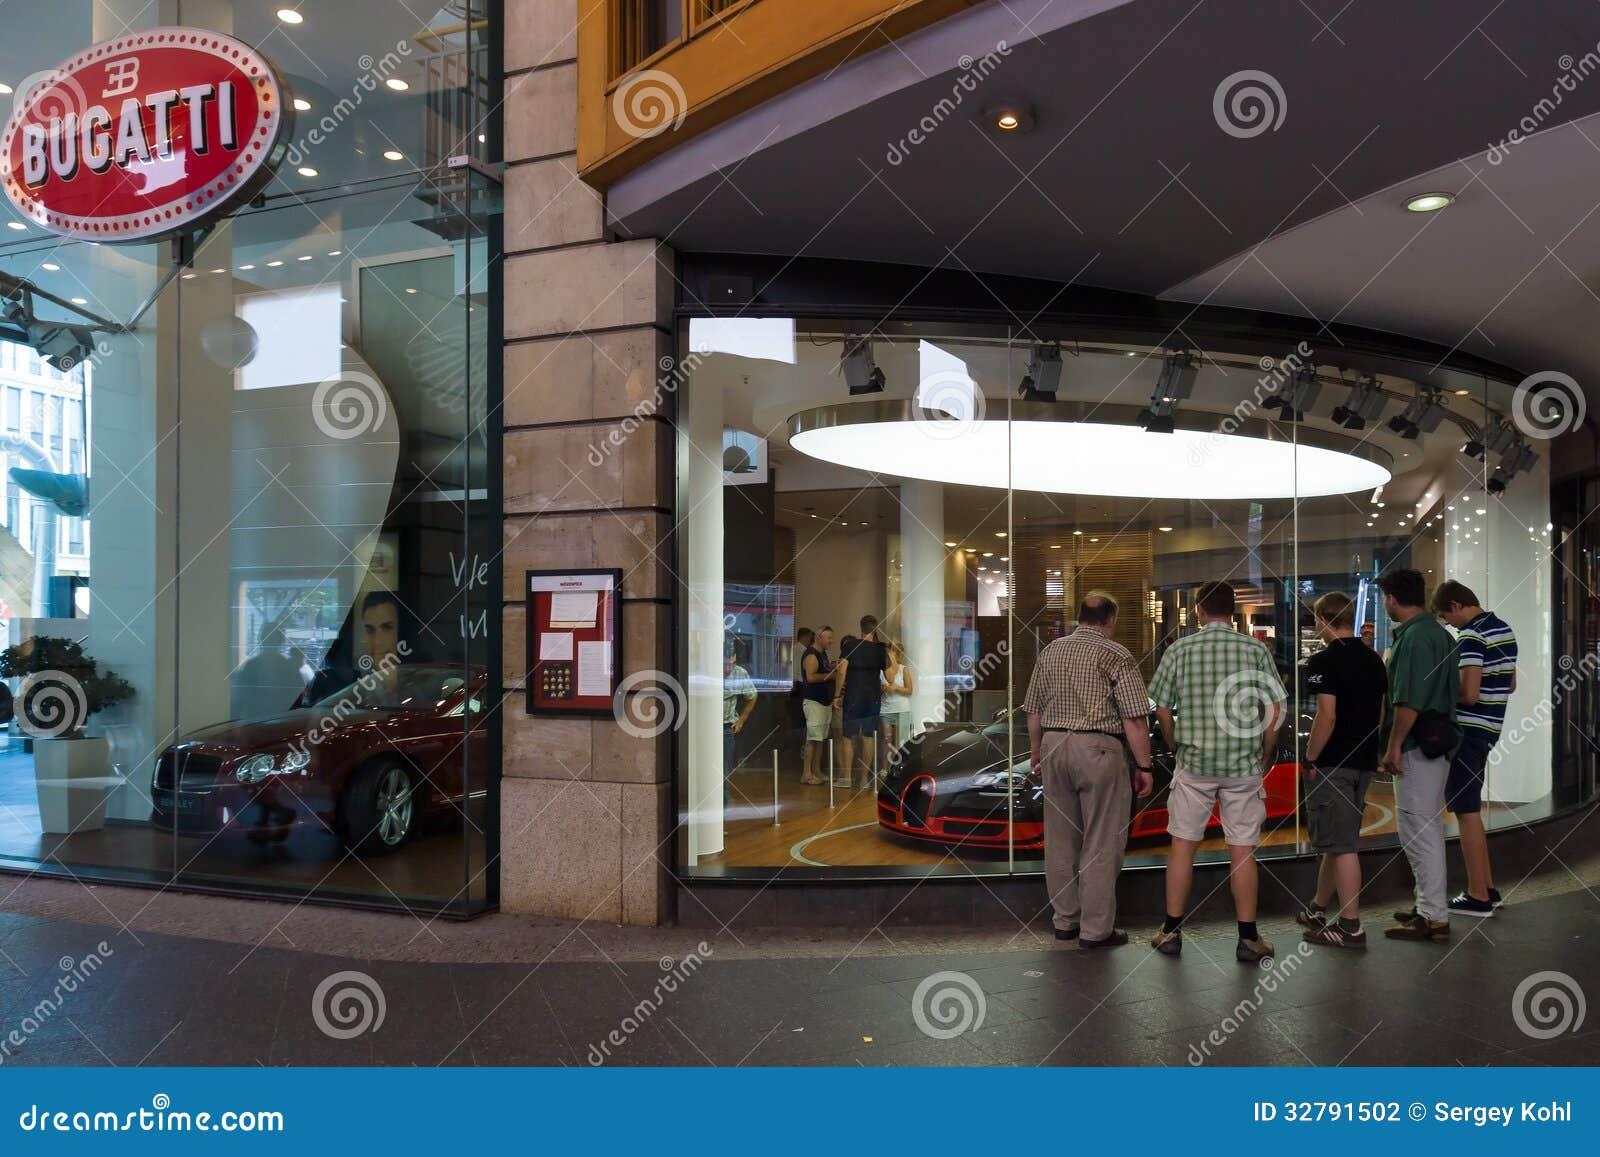 Bugatti Dealership On Friedrichstrasse Editorial